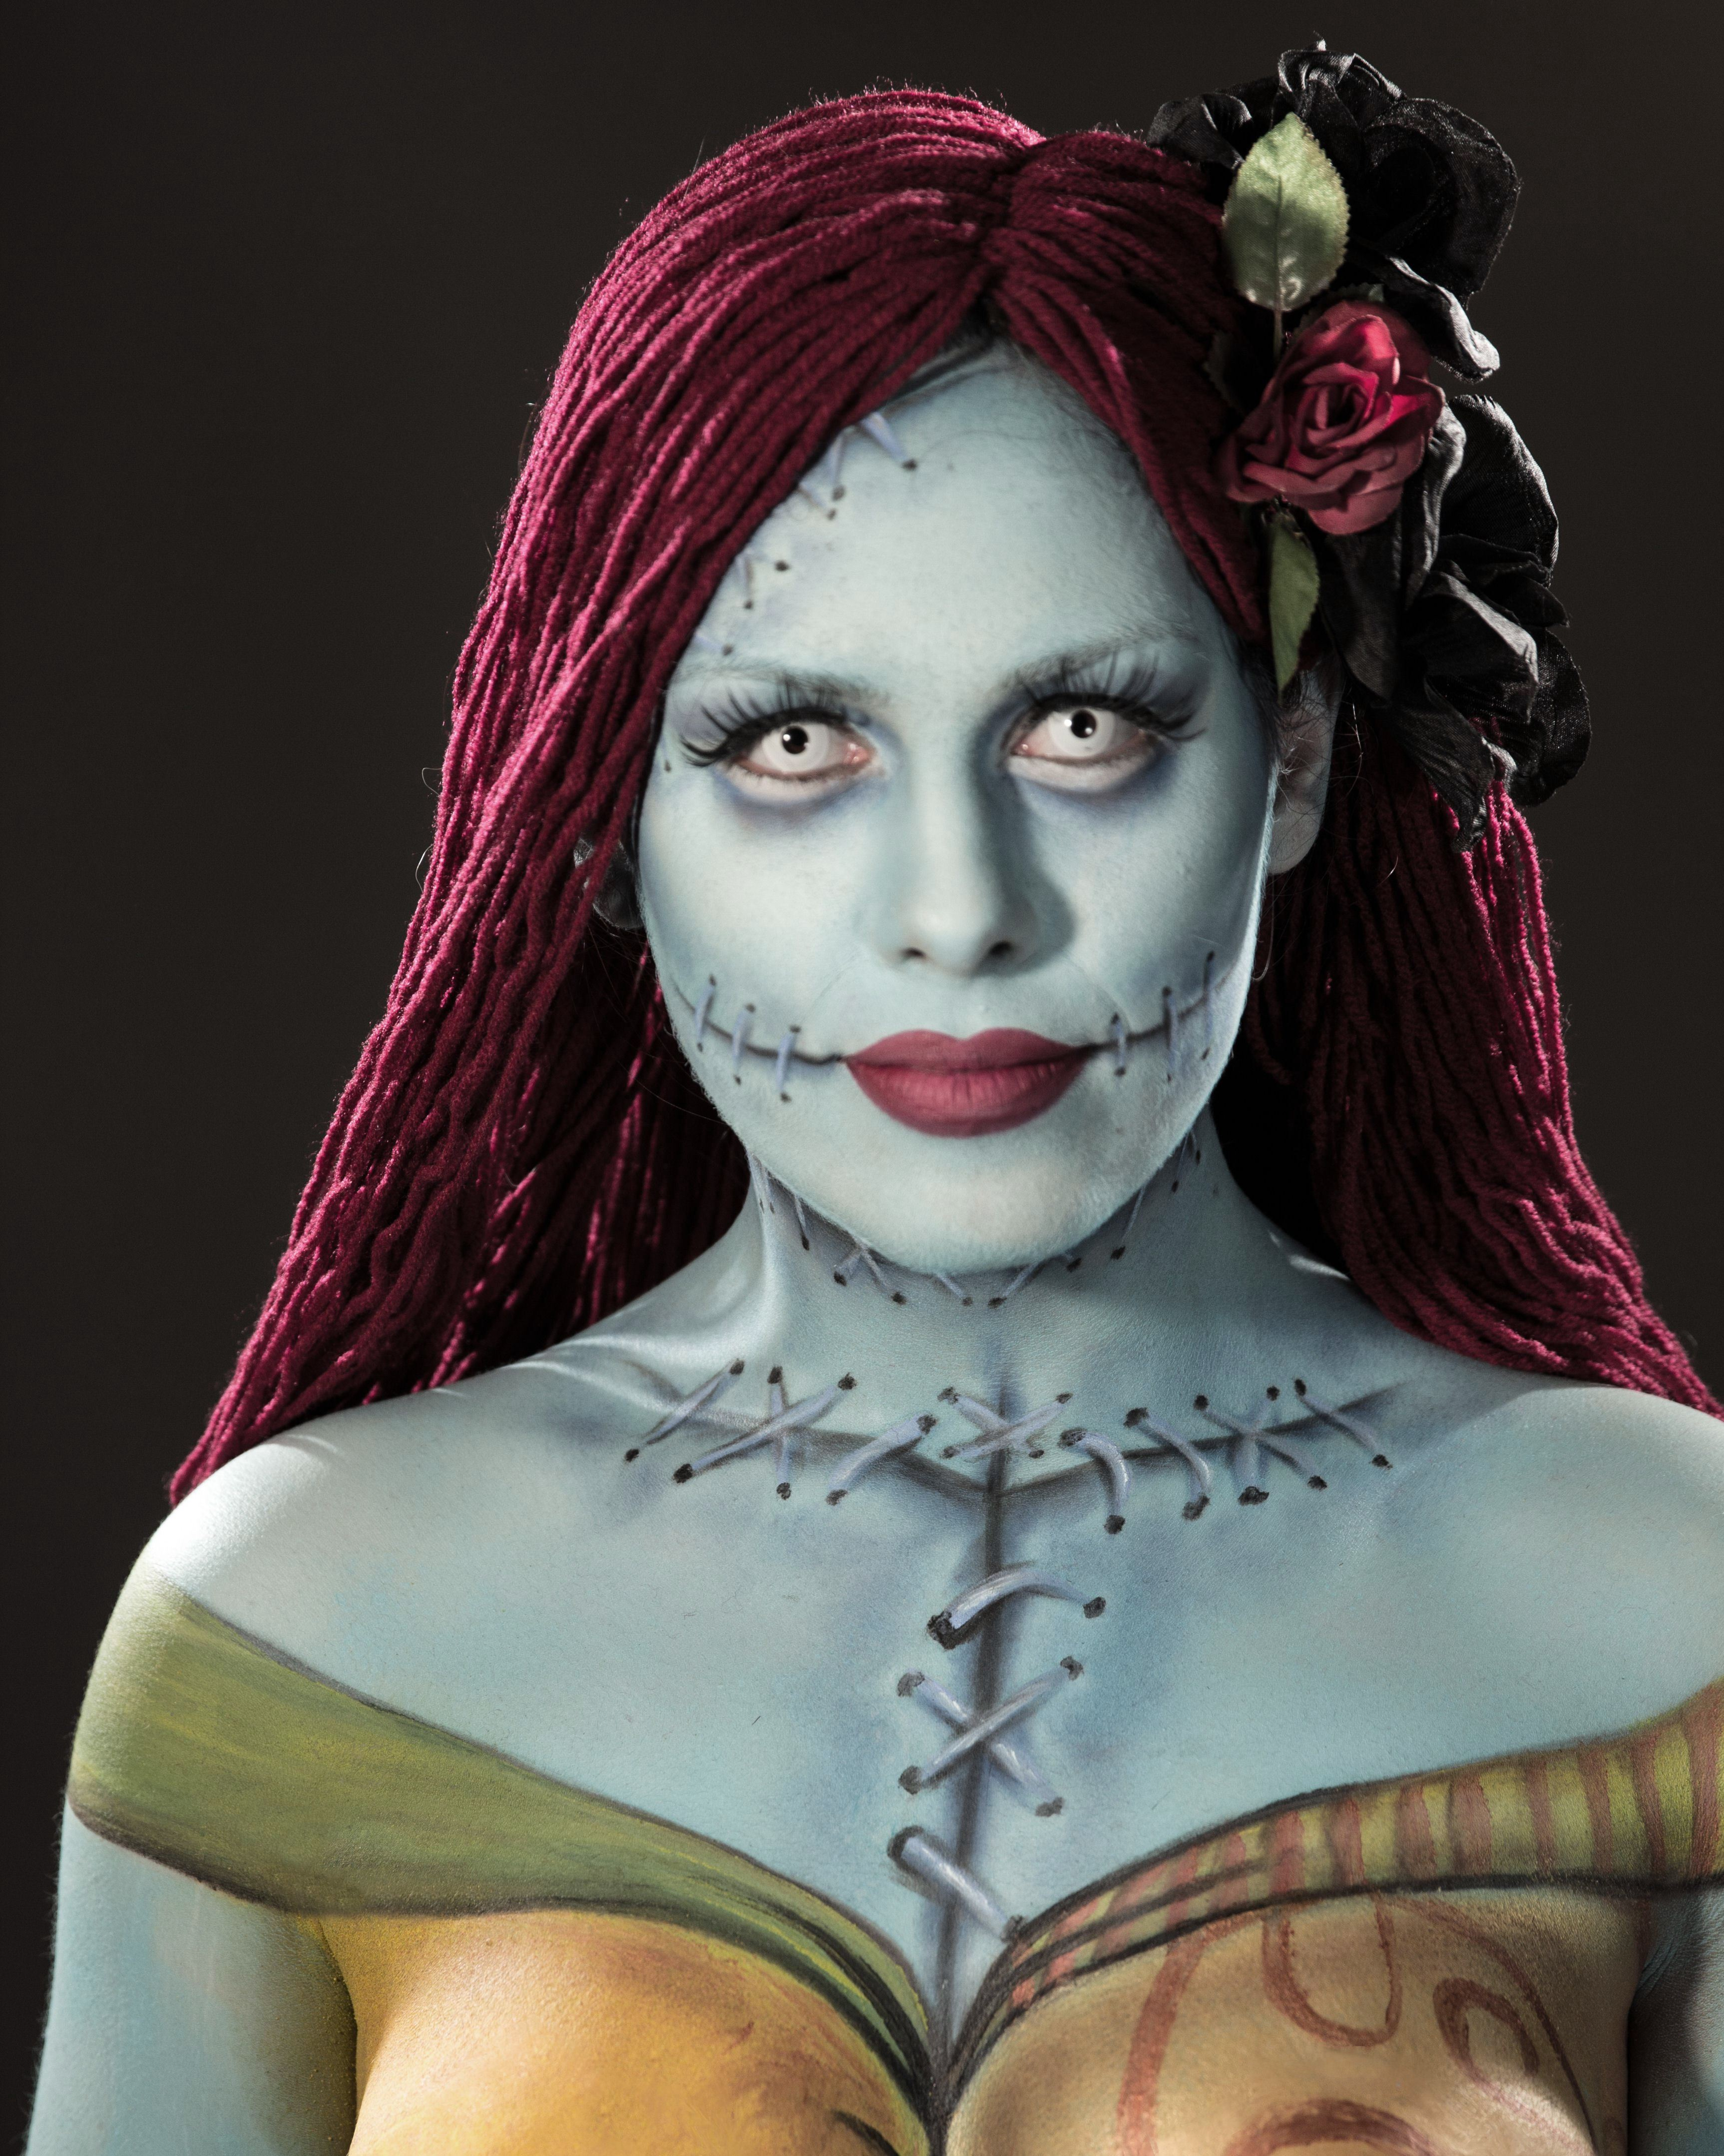 Nightmare Before Christmas/Sally inspired body paint | maramakeup